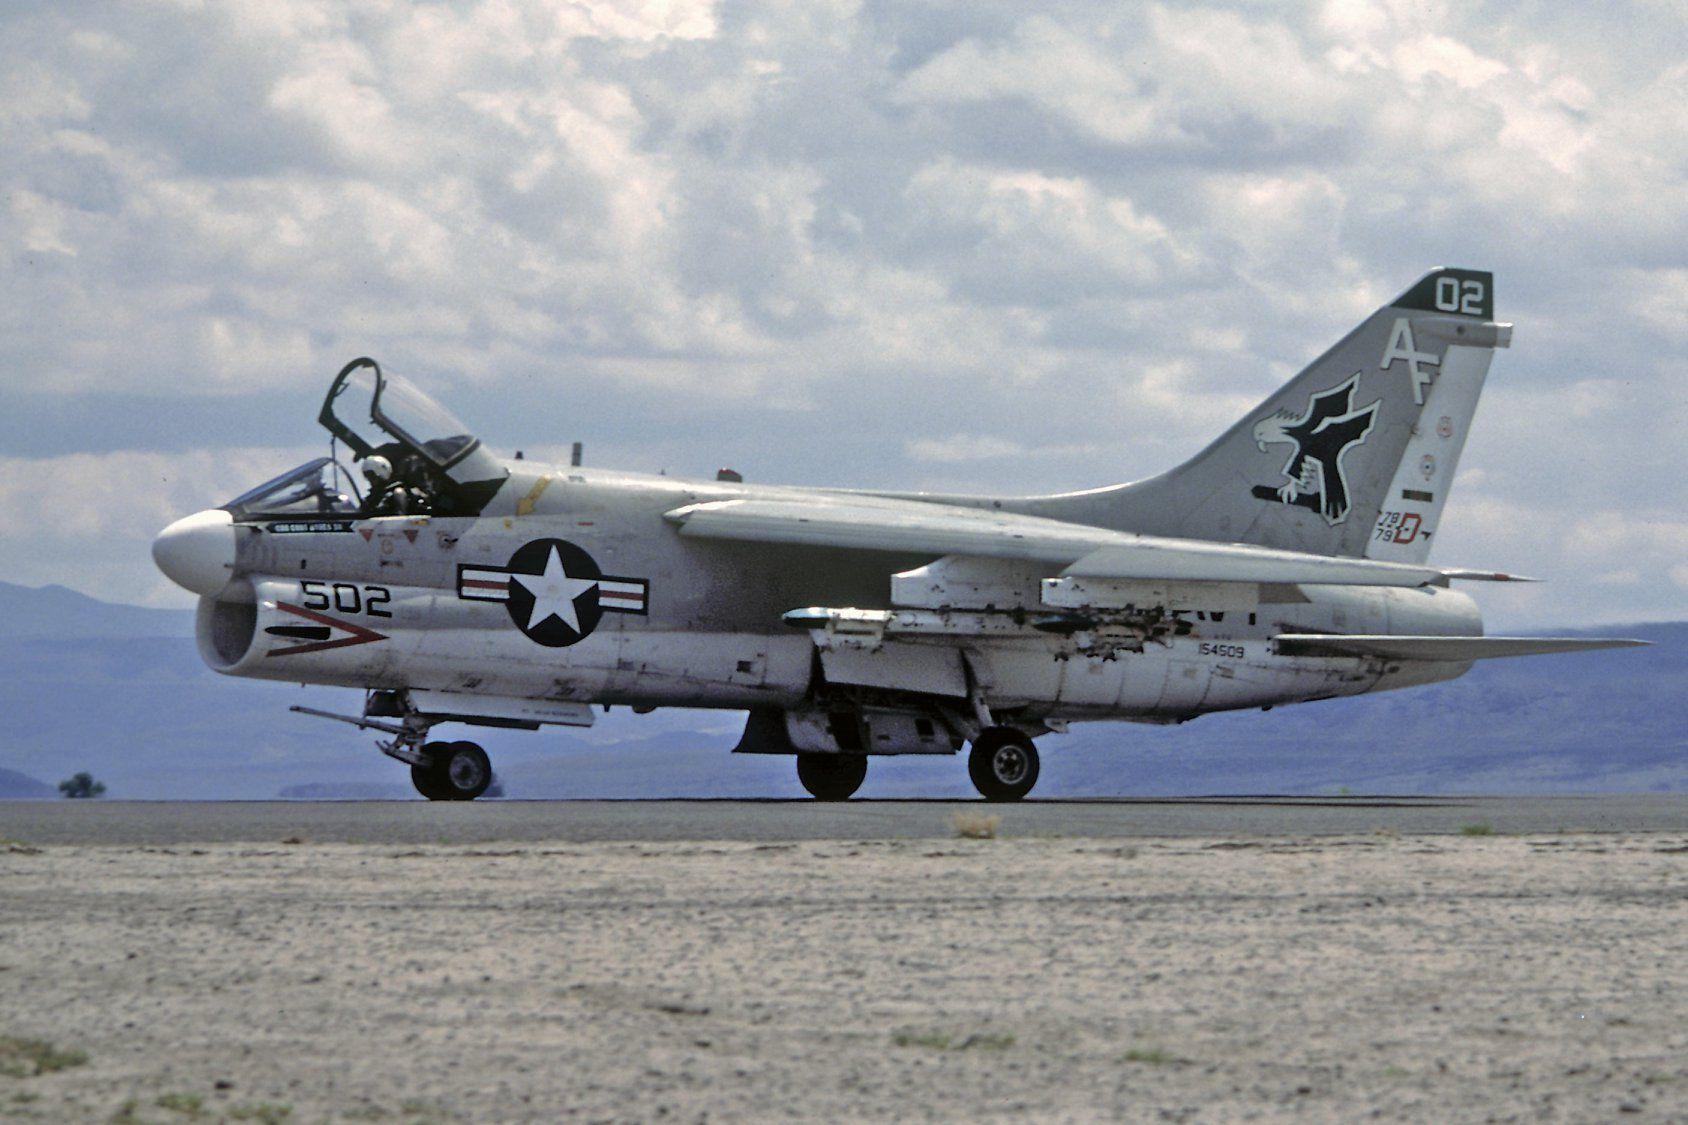 A7B, VA205, NAS Fallon. Naval aviator, Fighter planes